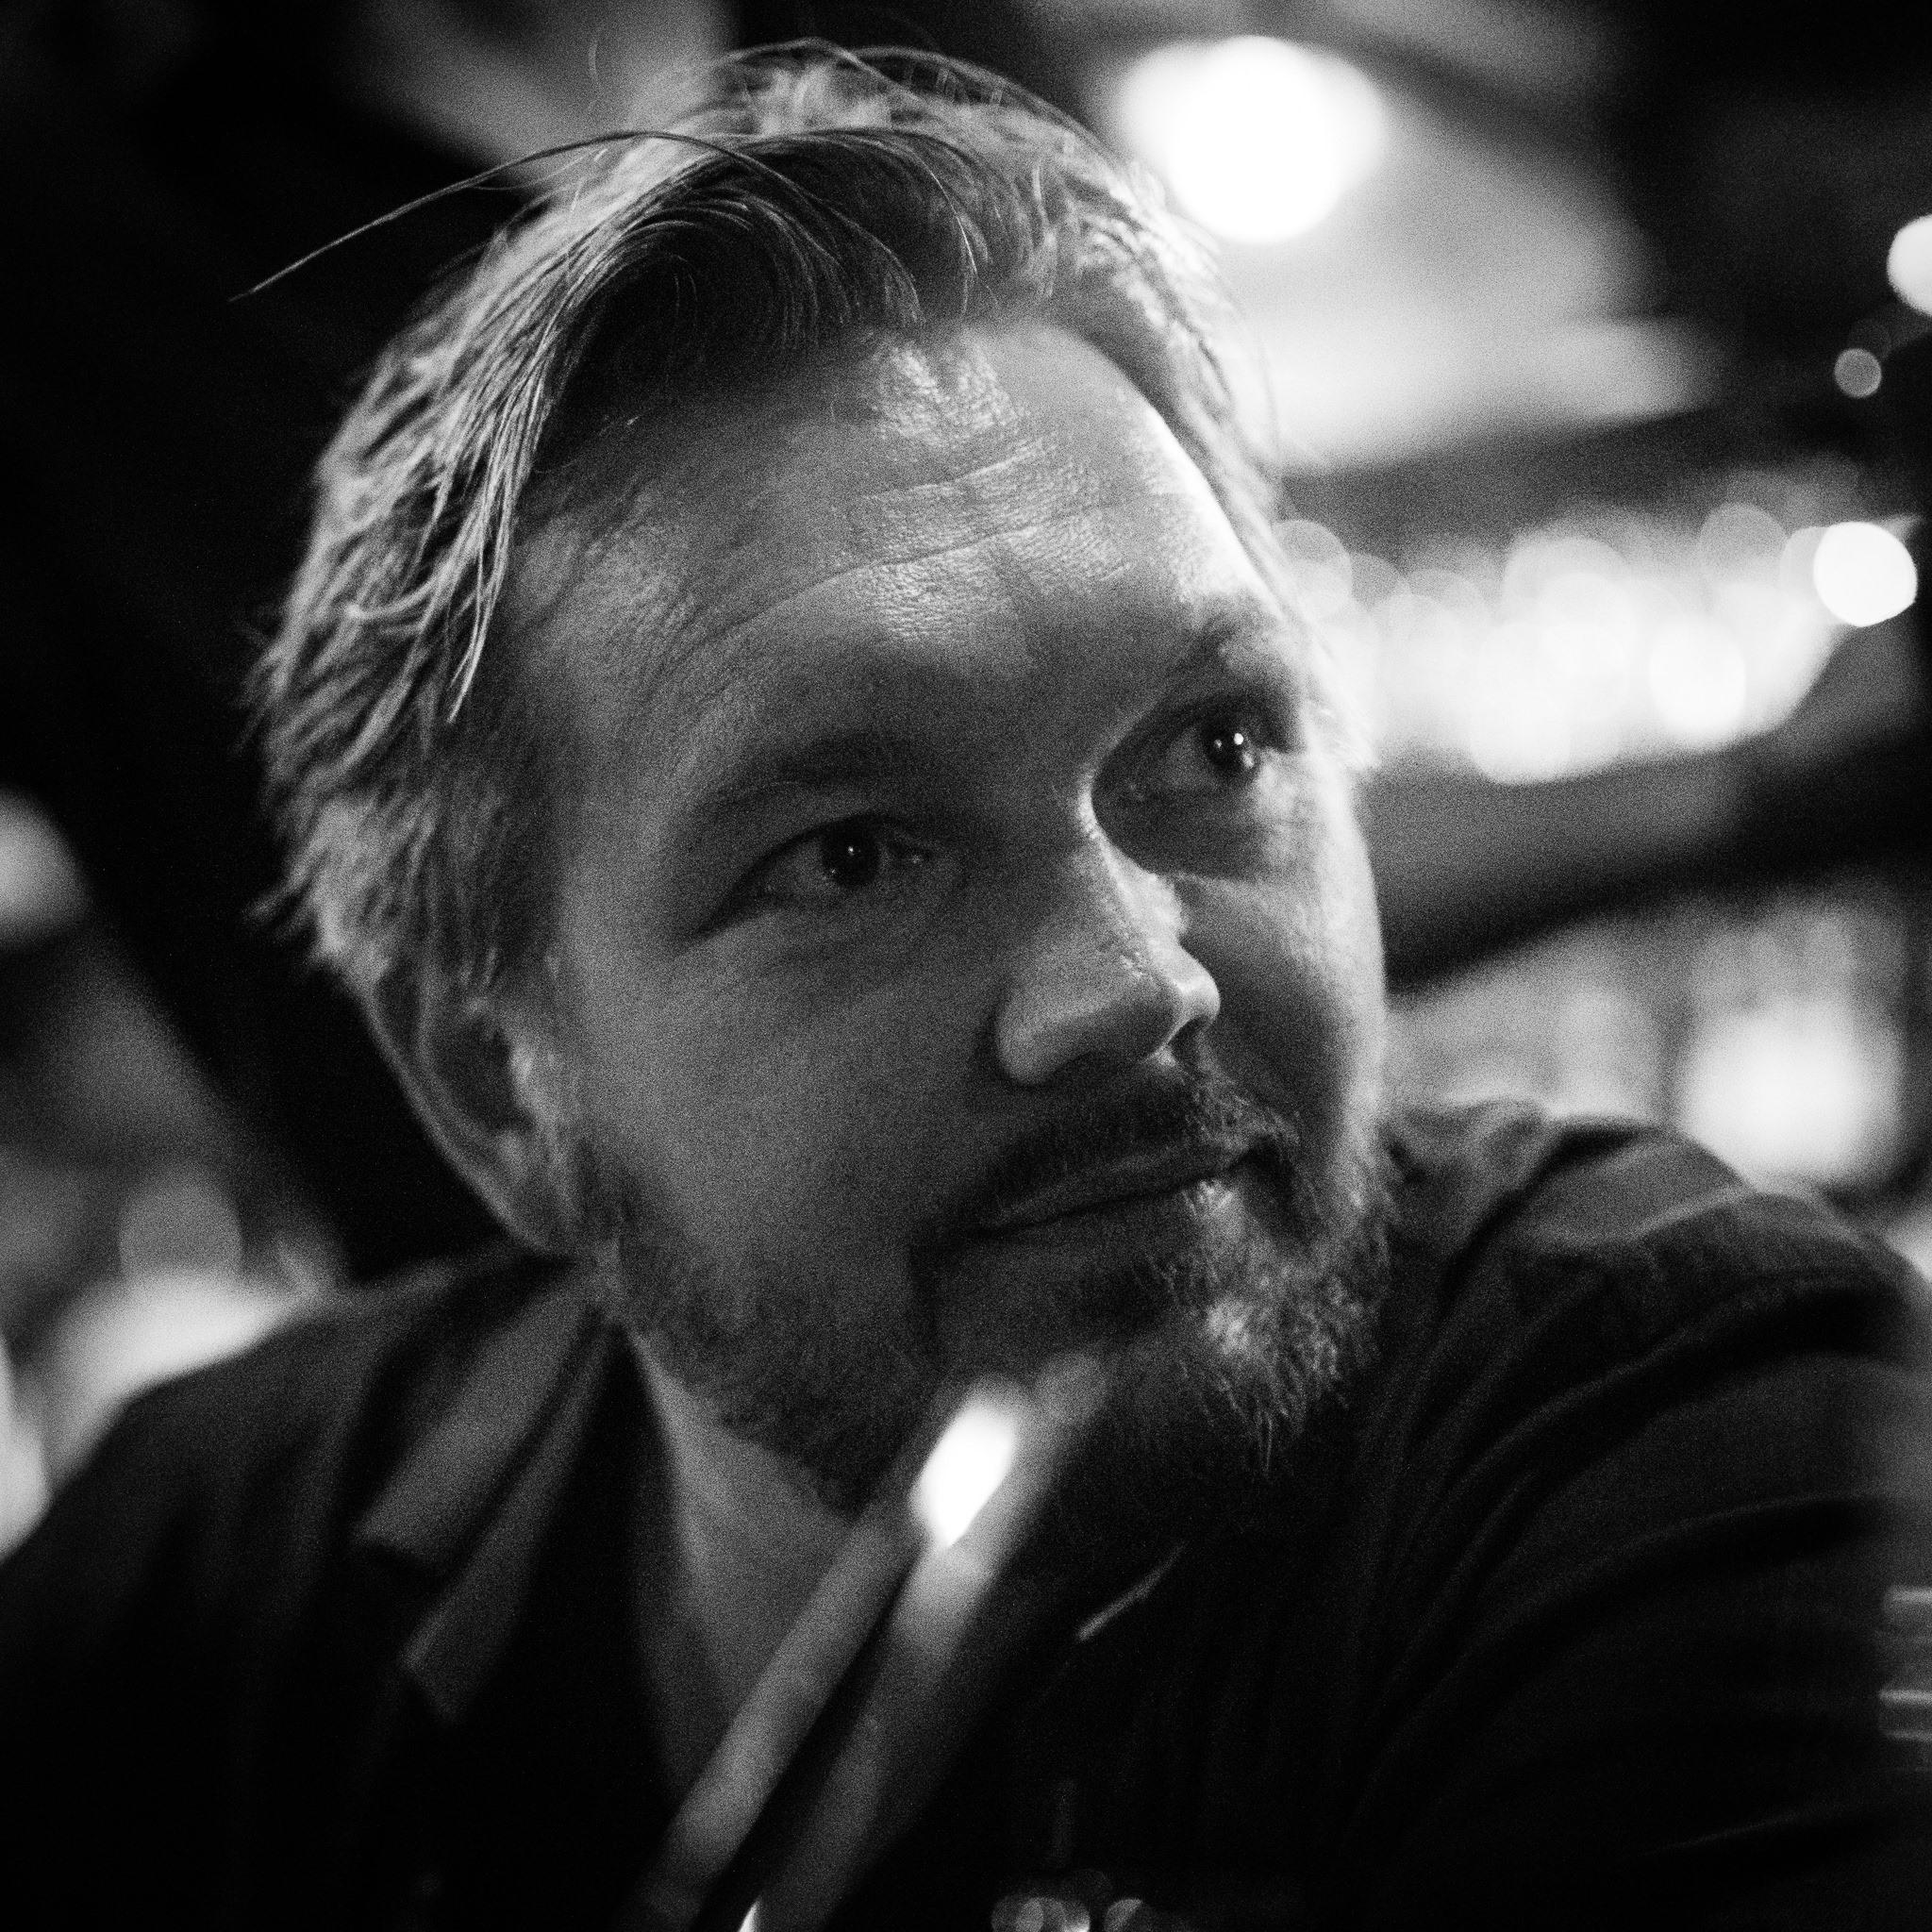 Fotograf Jakob Æbeløe Kjøller